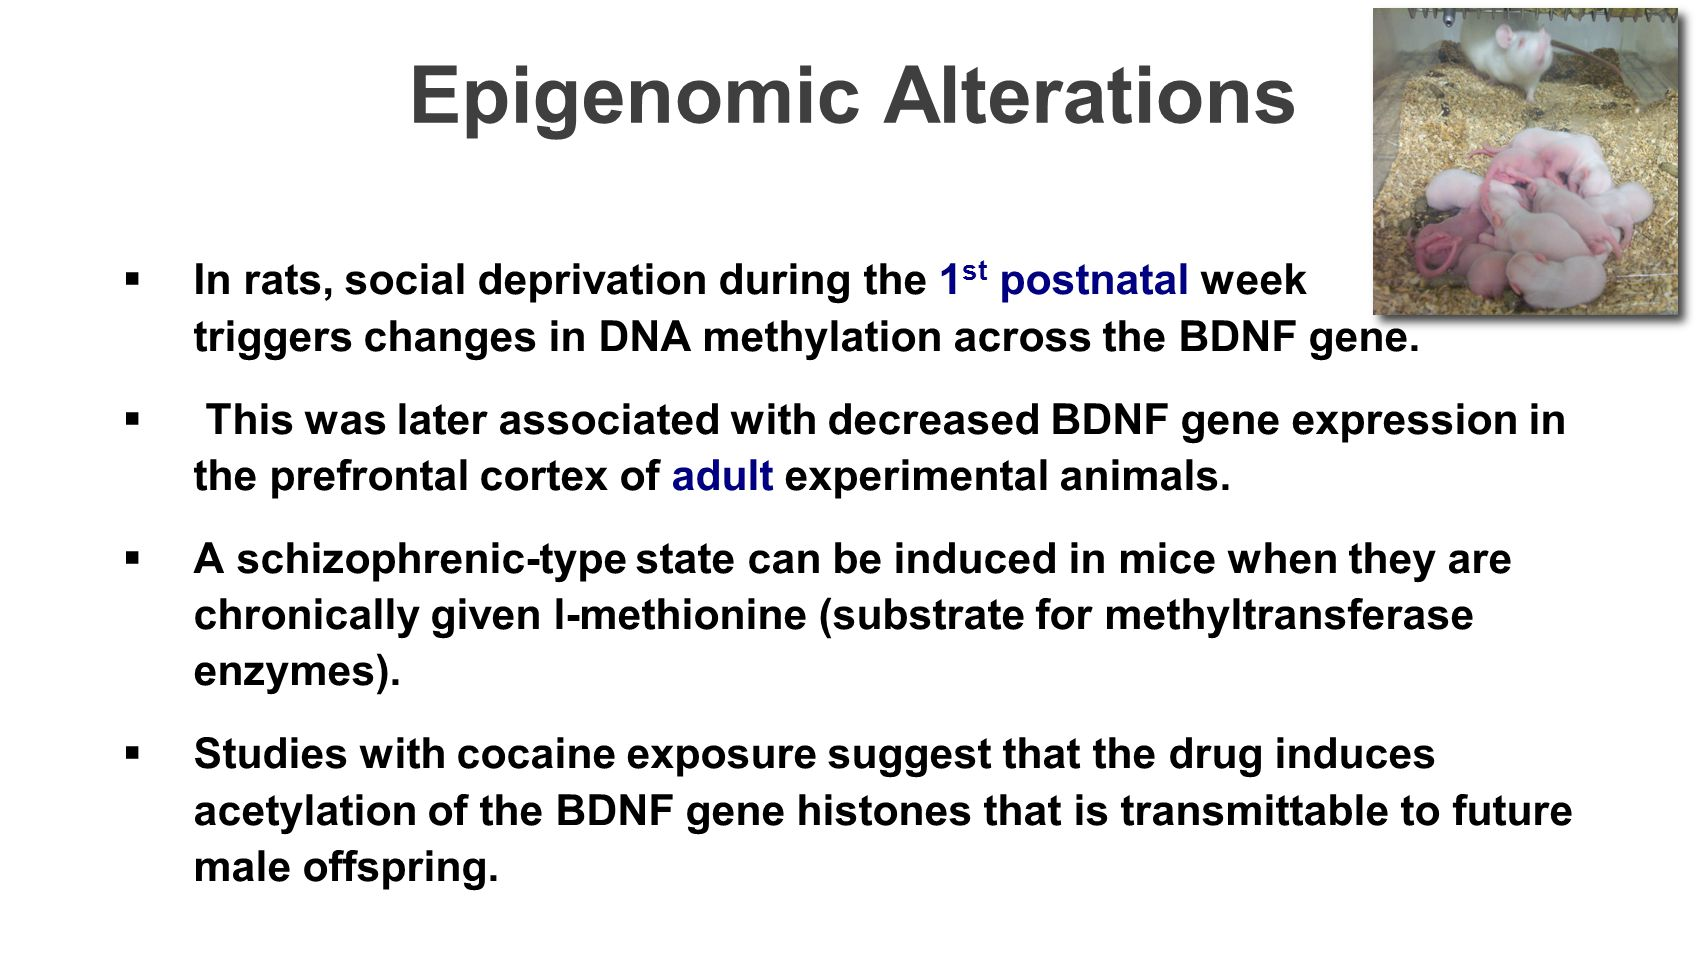 Epigenomic Alterations